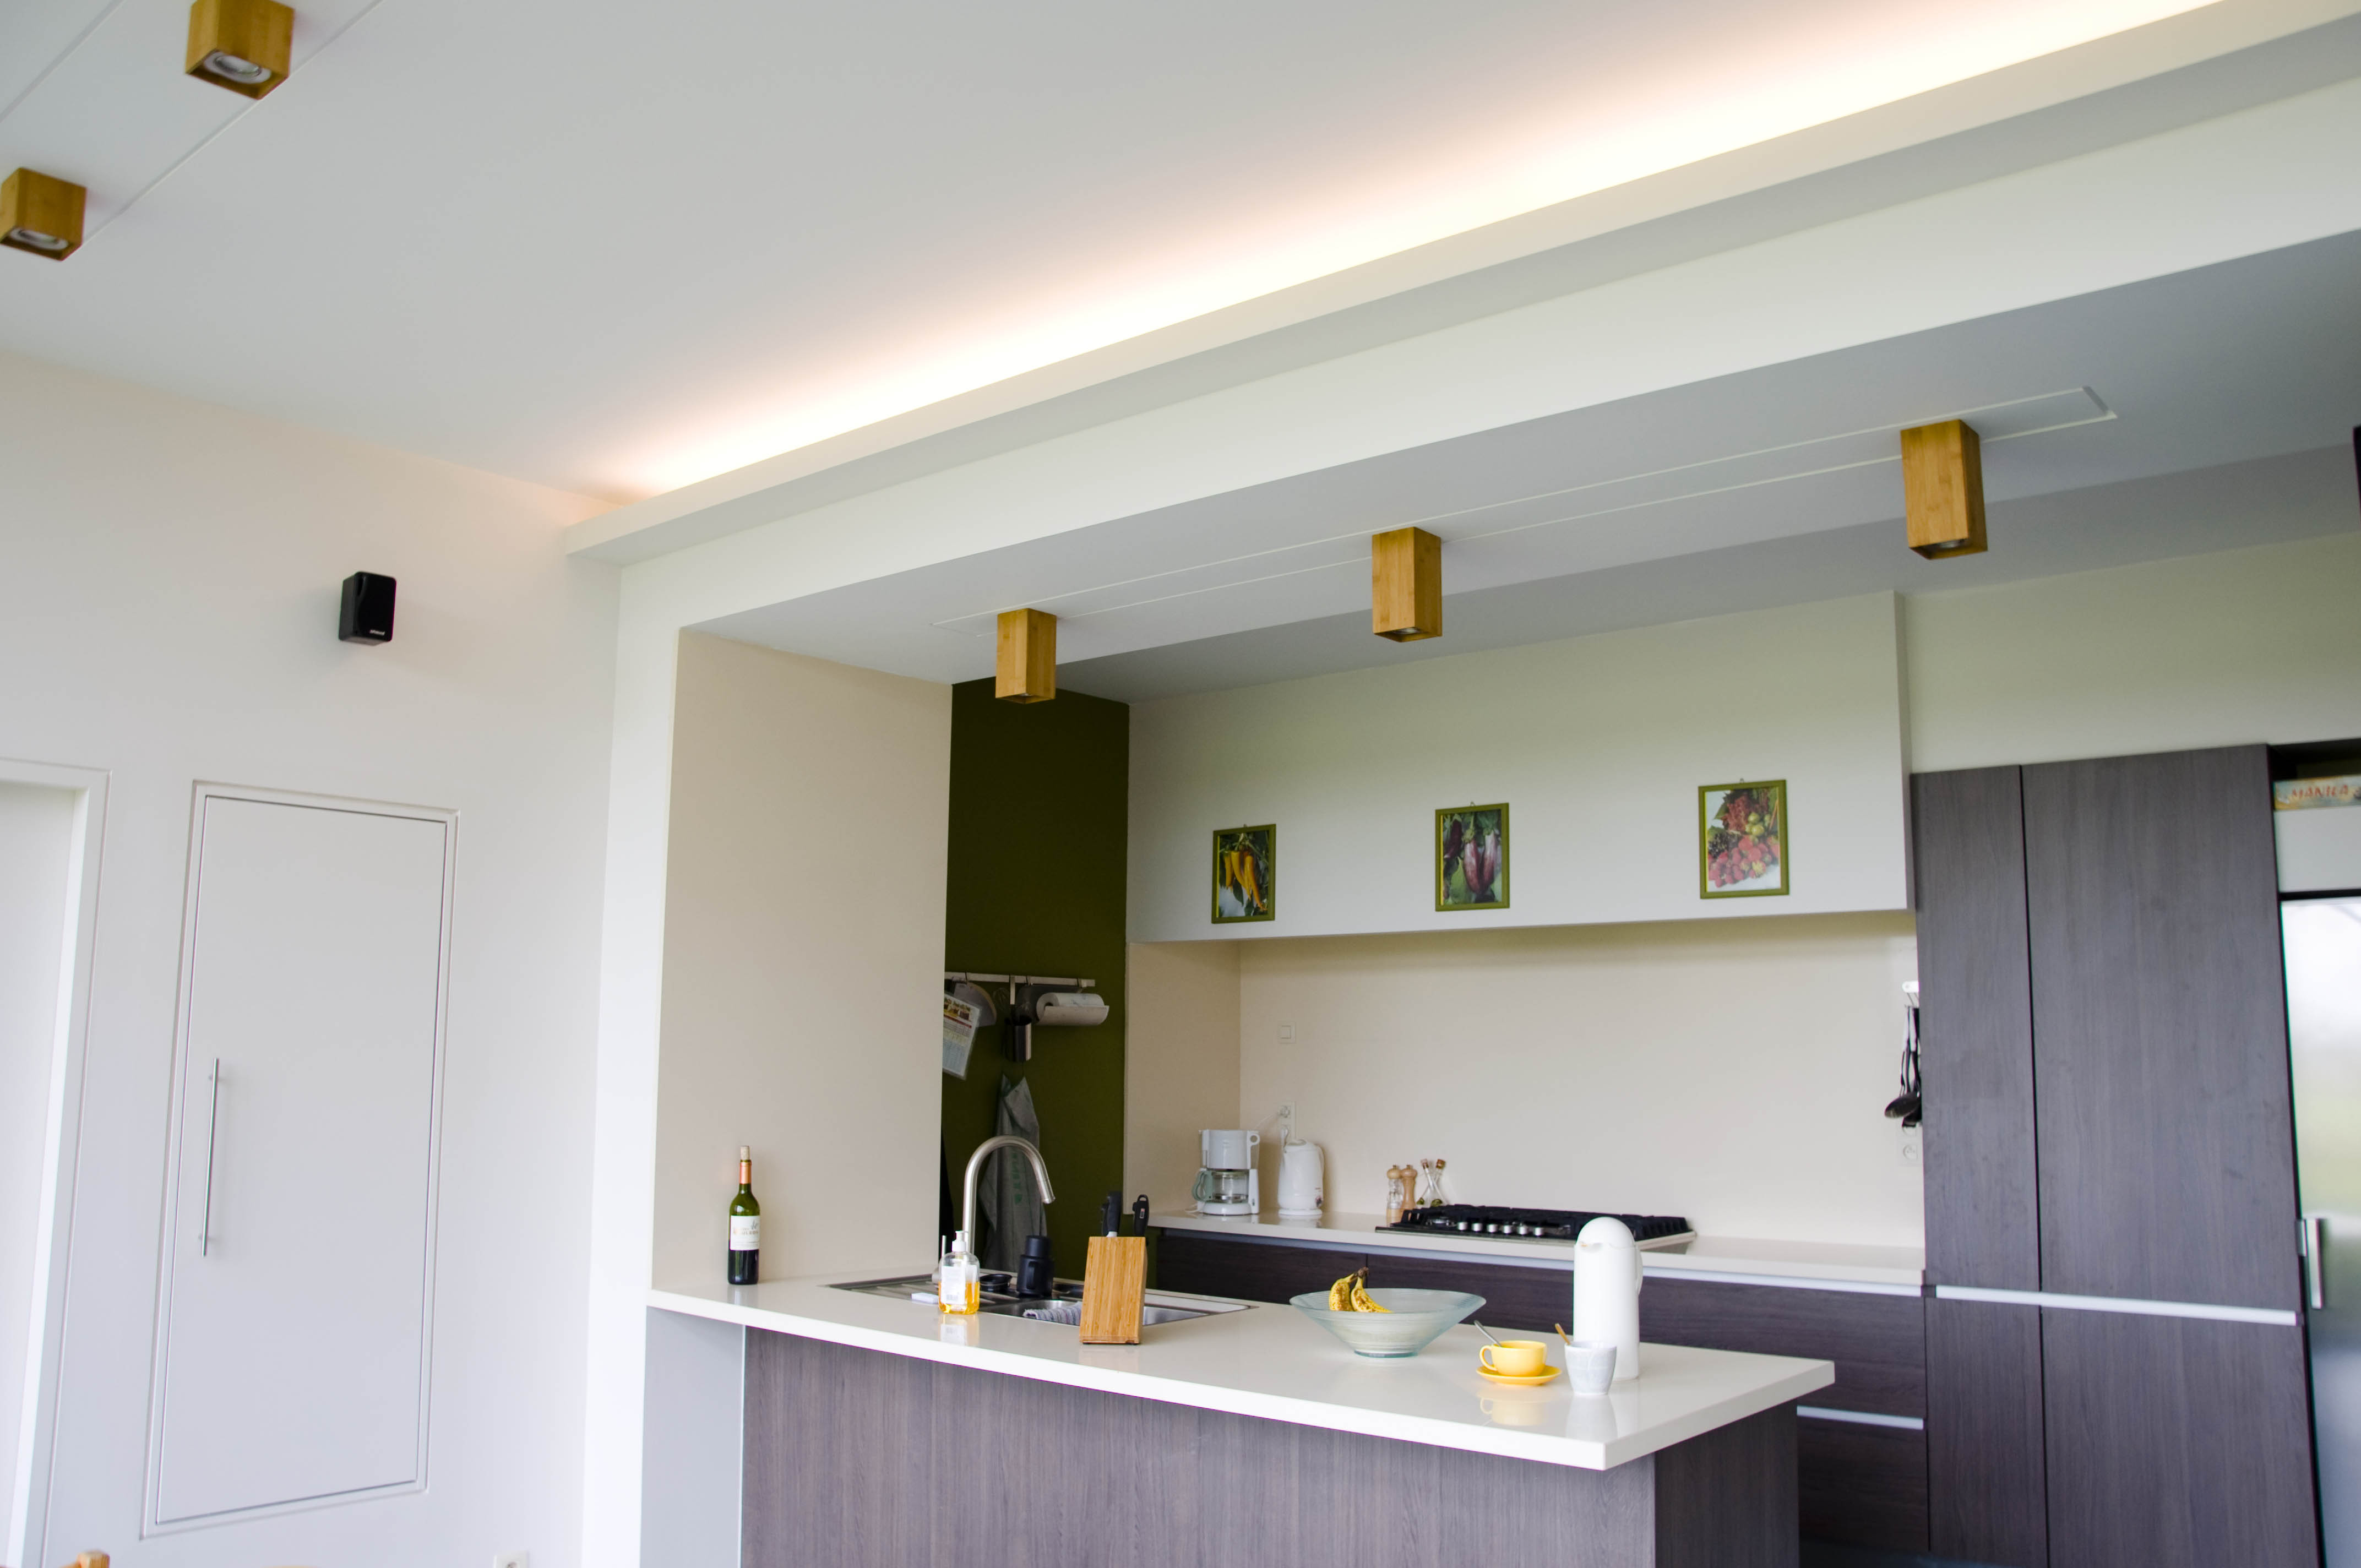 Verlichting keuken plafond for Plafond sierlijst